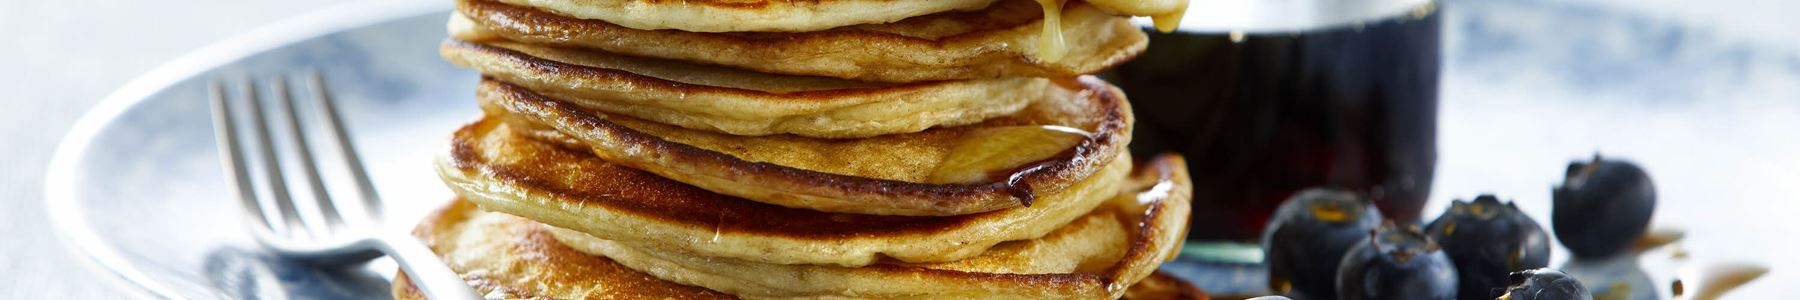 Amerikansk + Morgenmad